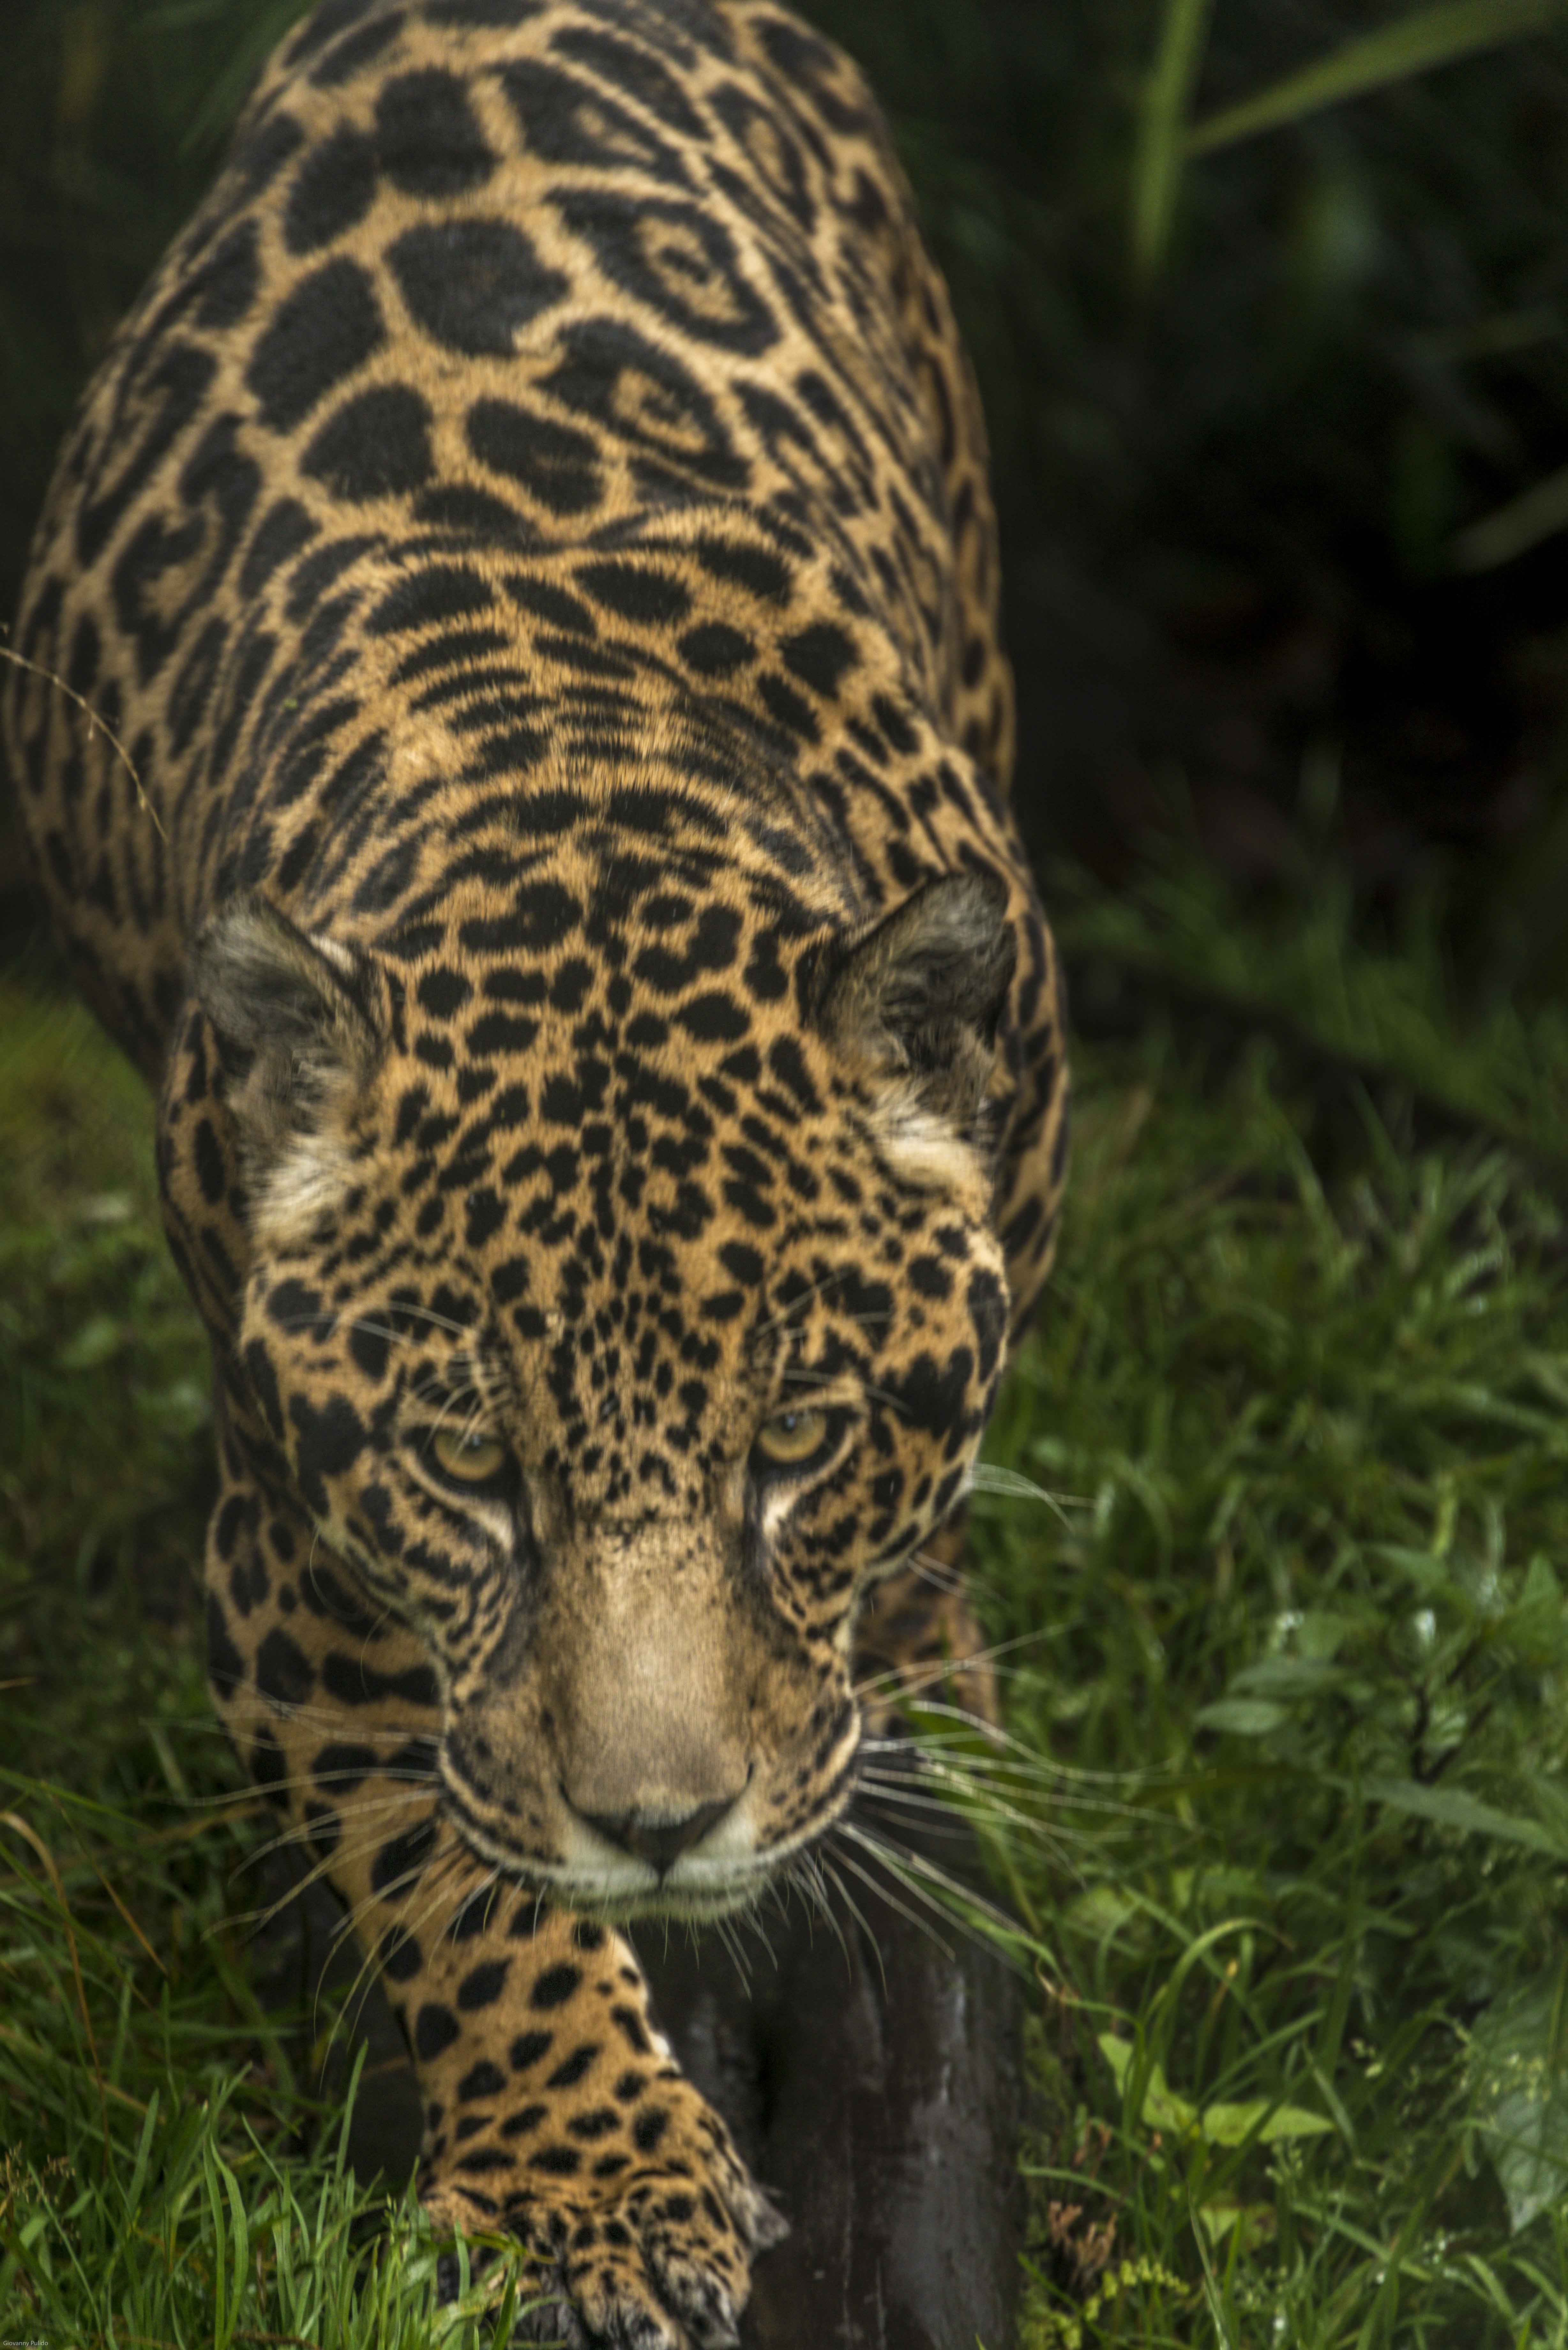 Jaguar 2 foto por Giovanny Pulido